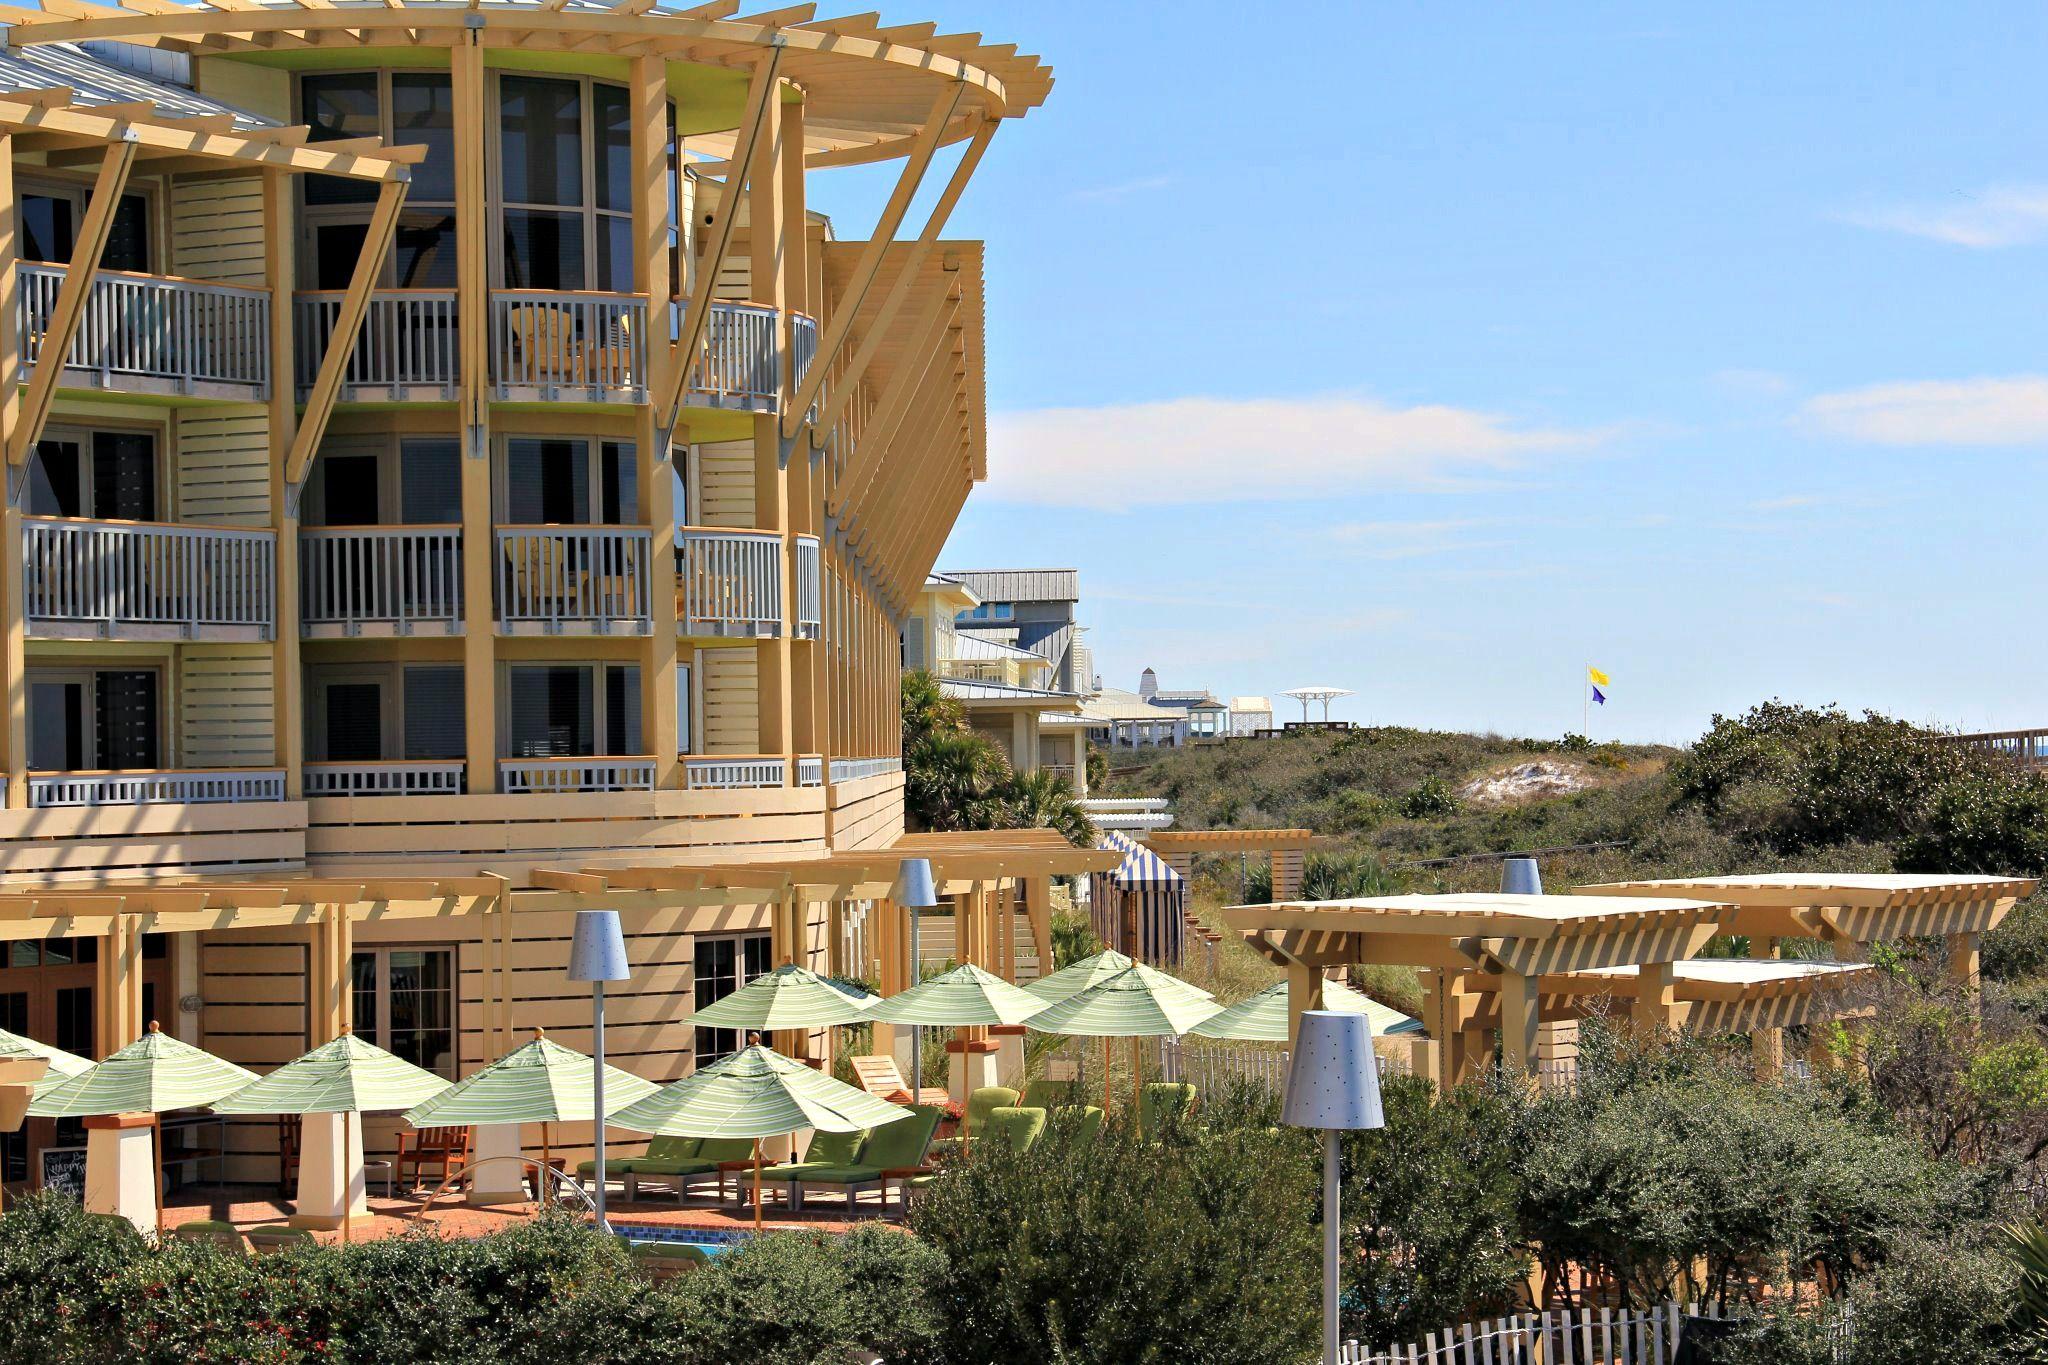 Watercolor Inn Resort On Hwy 30a Watercolor Inn And Resort Beach Place Beach Getaways